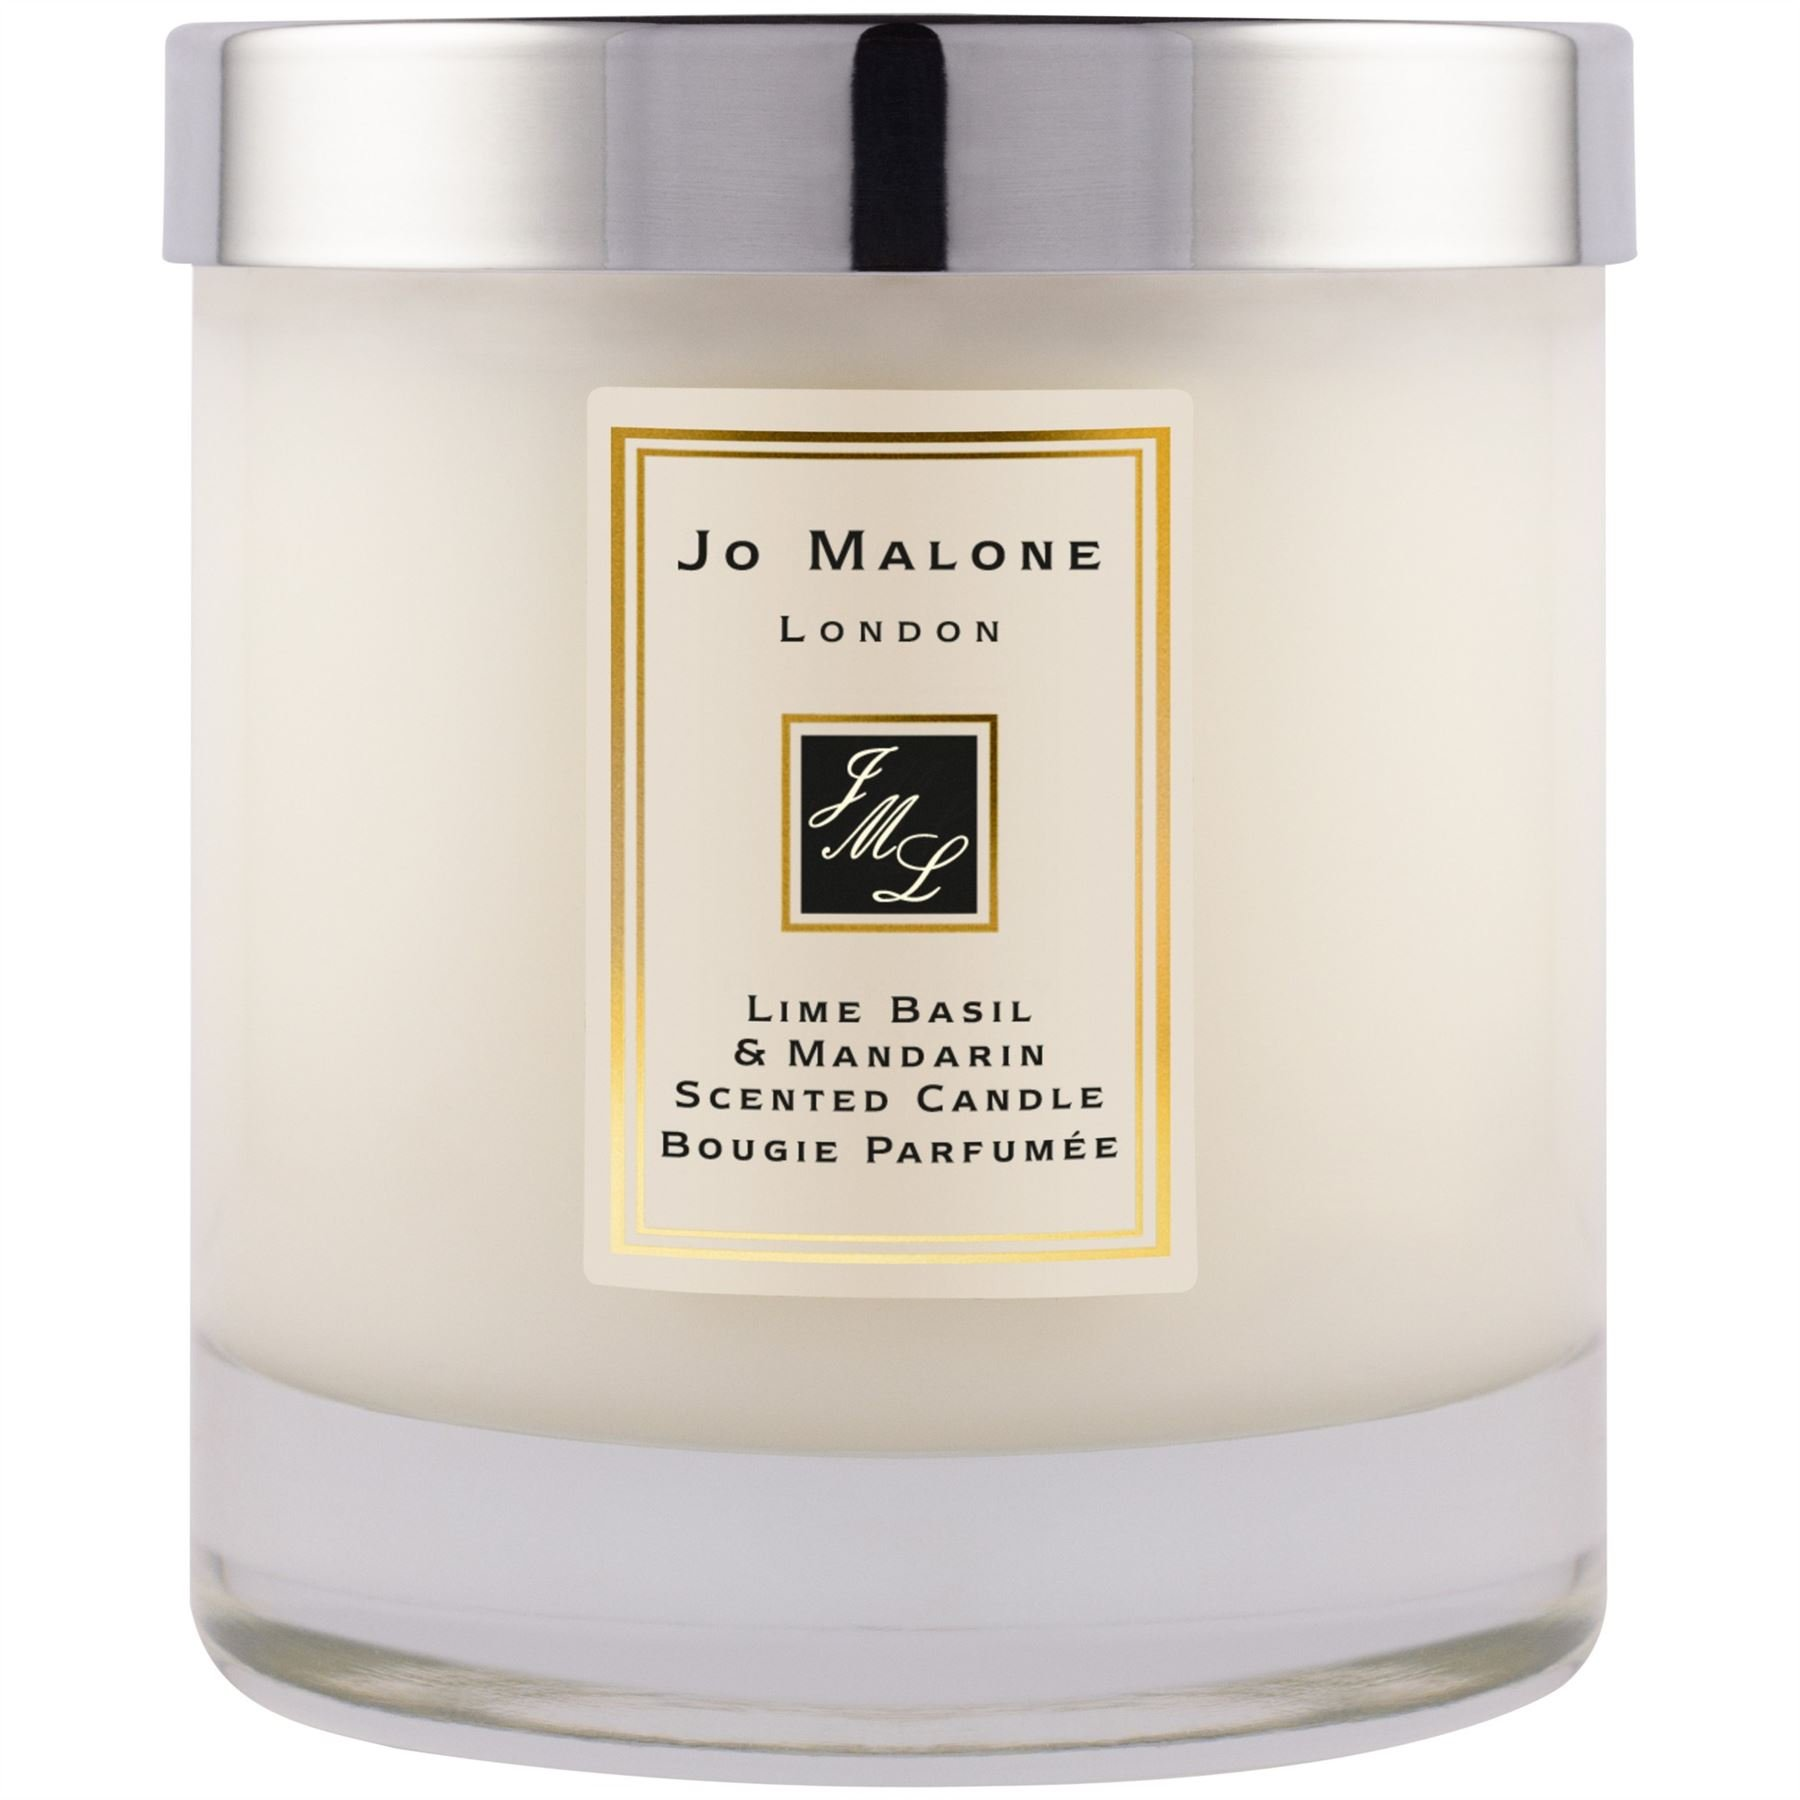 Jo Malone™ Lime Basil & Mandarin Home Candle 200g